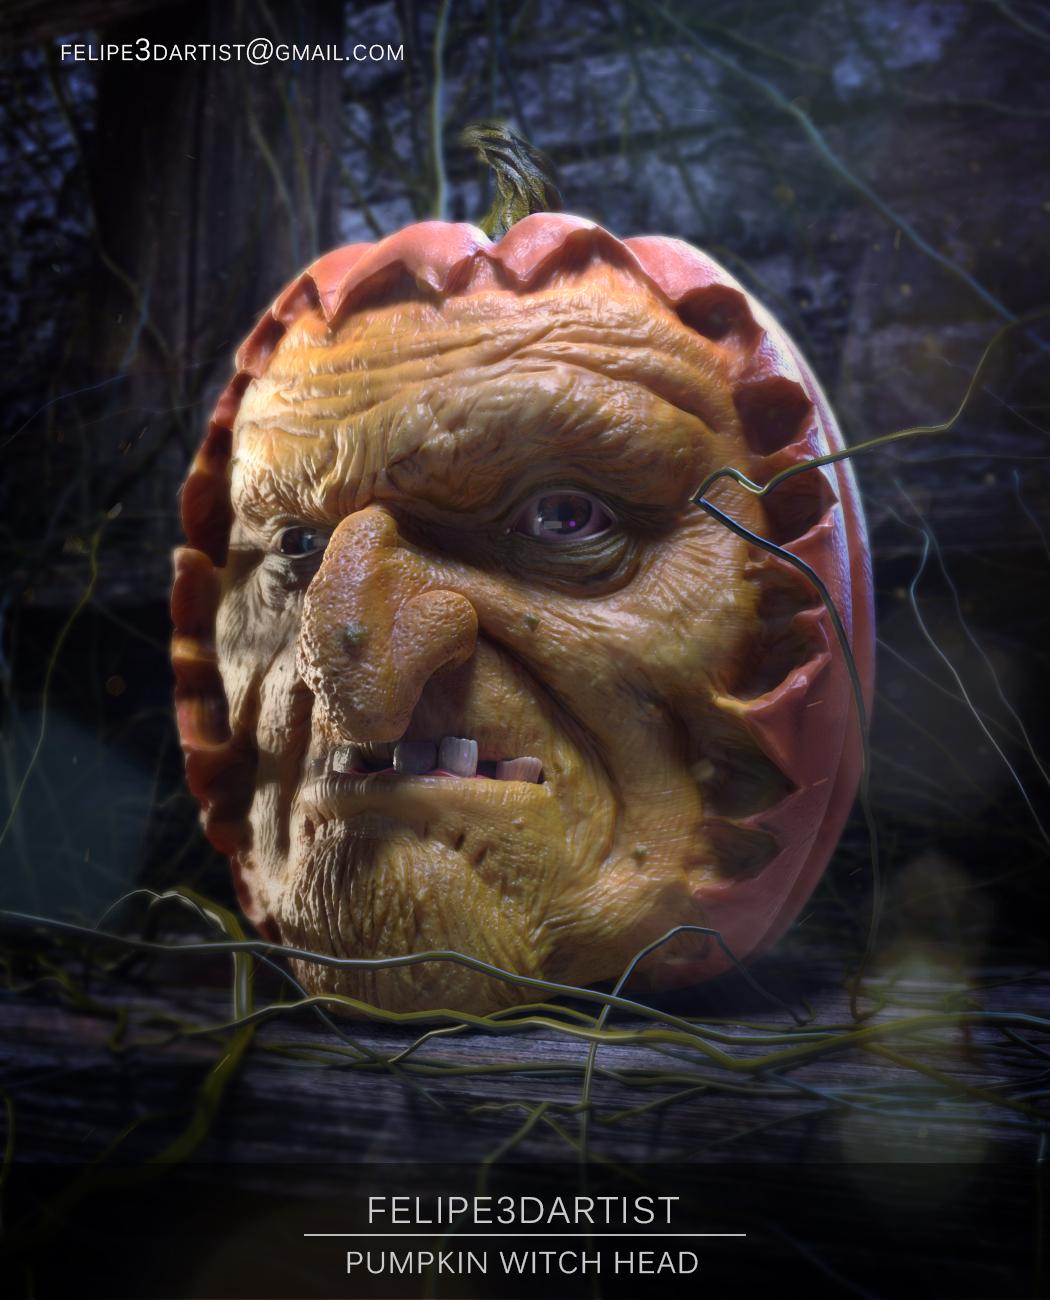 Felipe3dartist pumpkin witch head 1 8ad8636c vztj